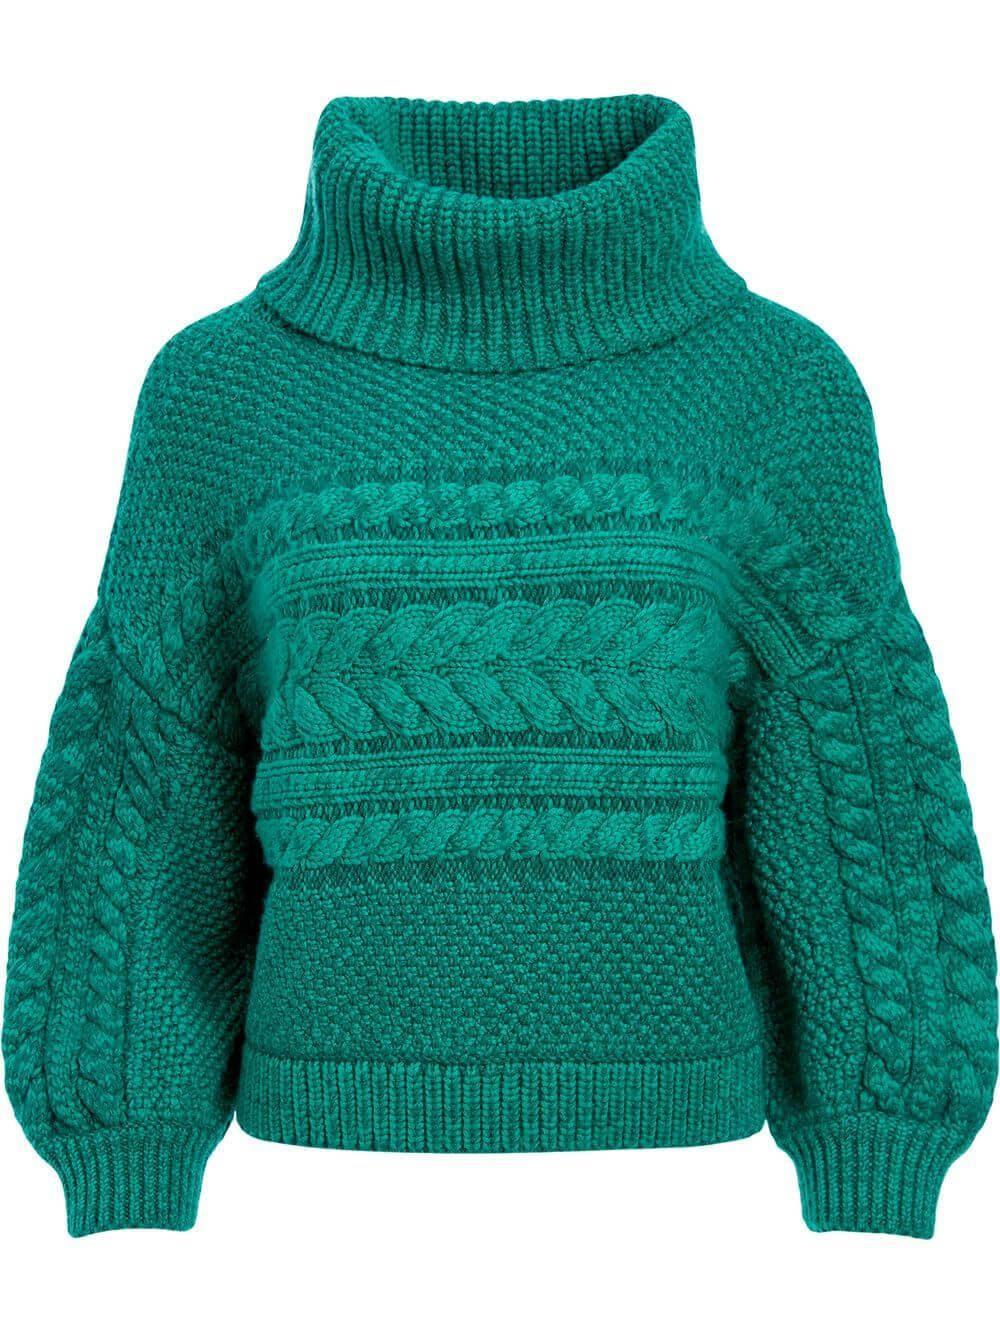 Franchie Turtleneck Sweater